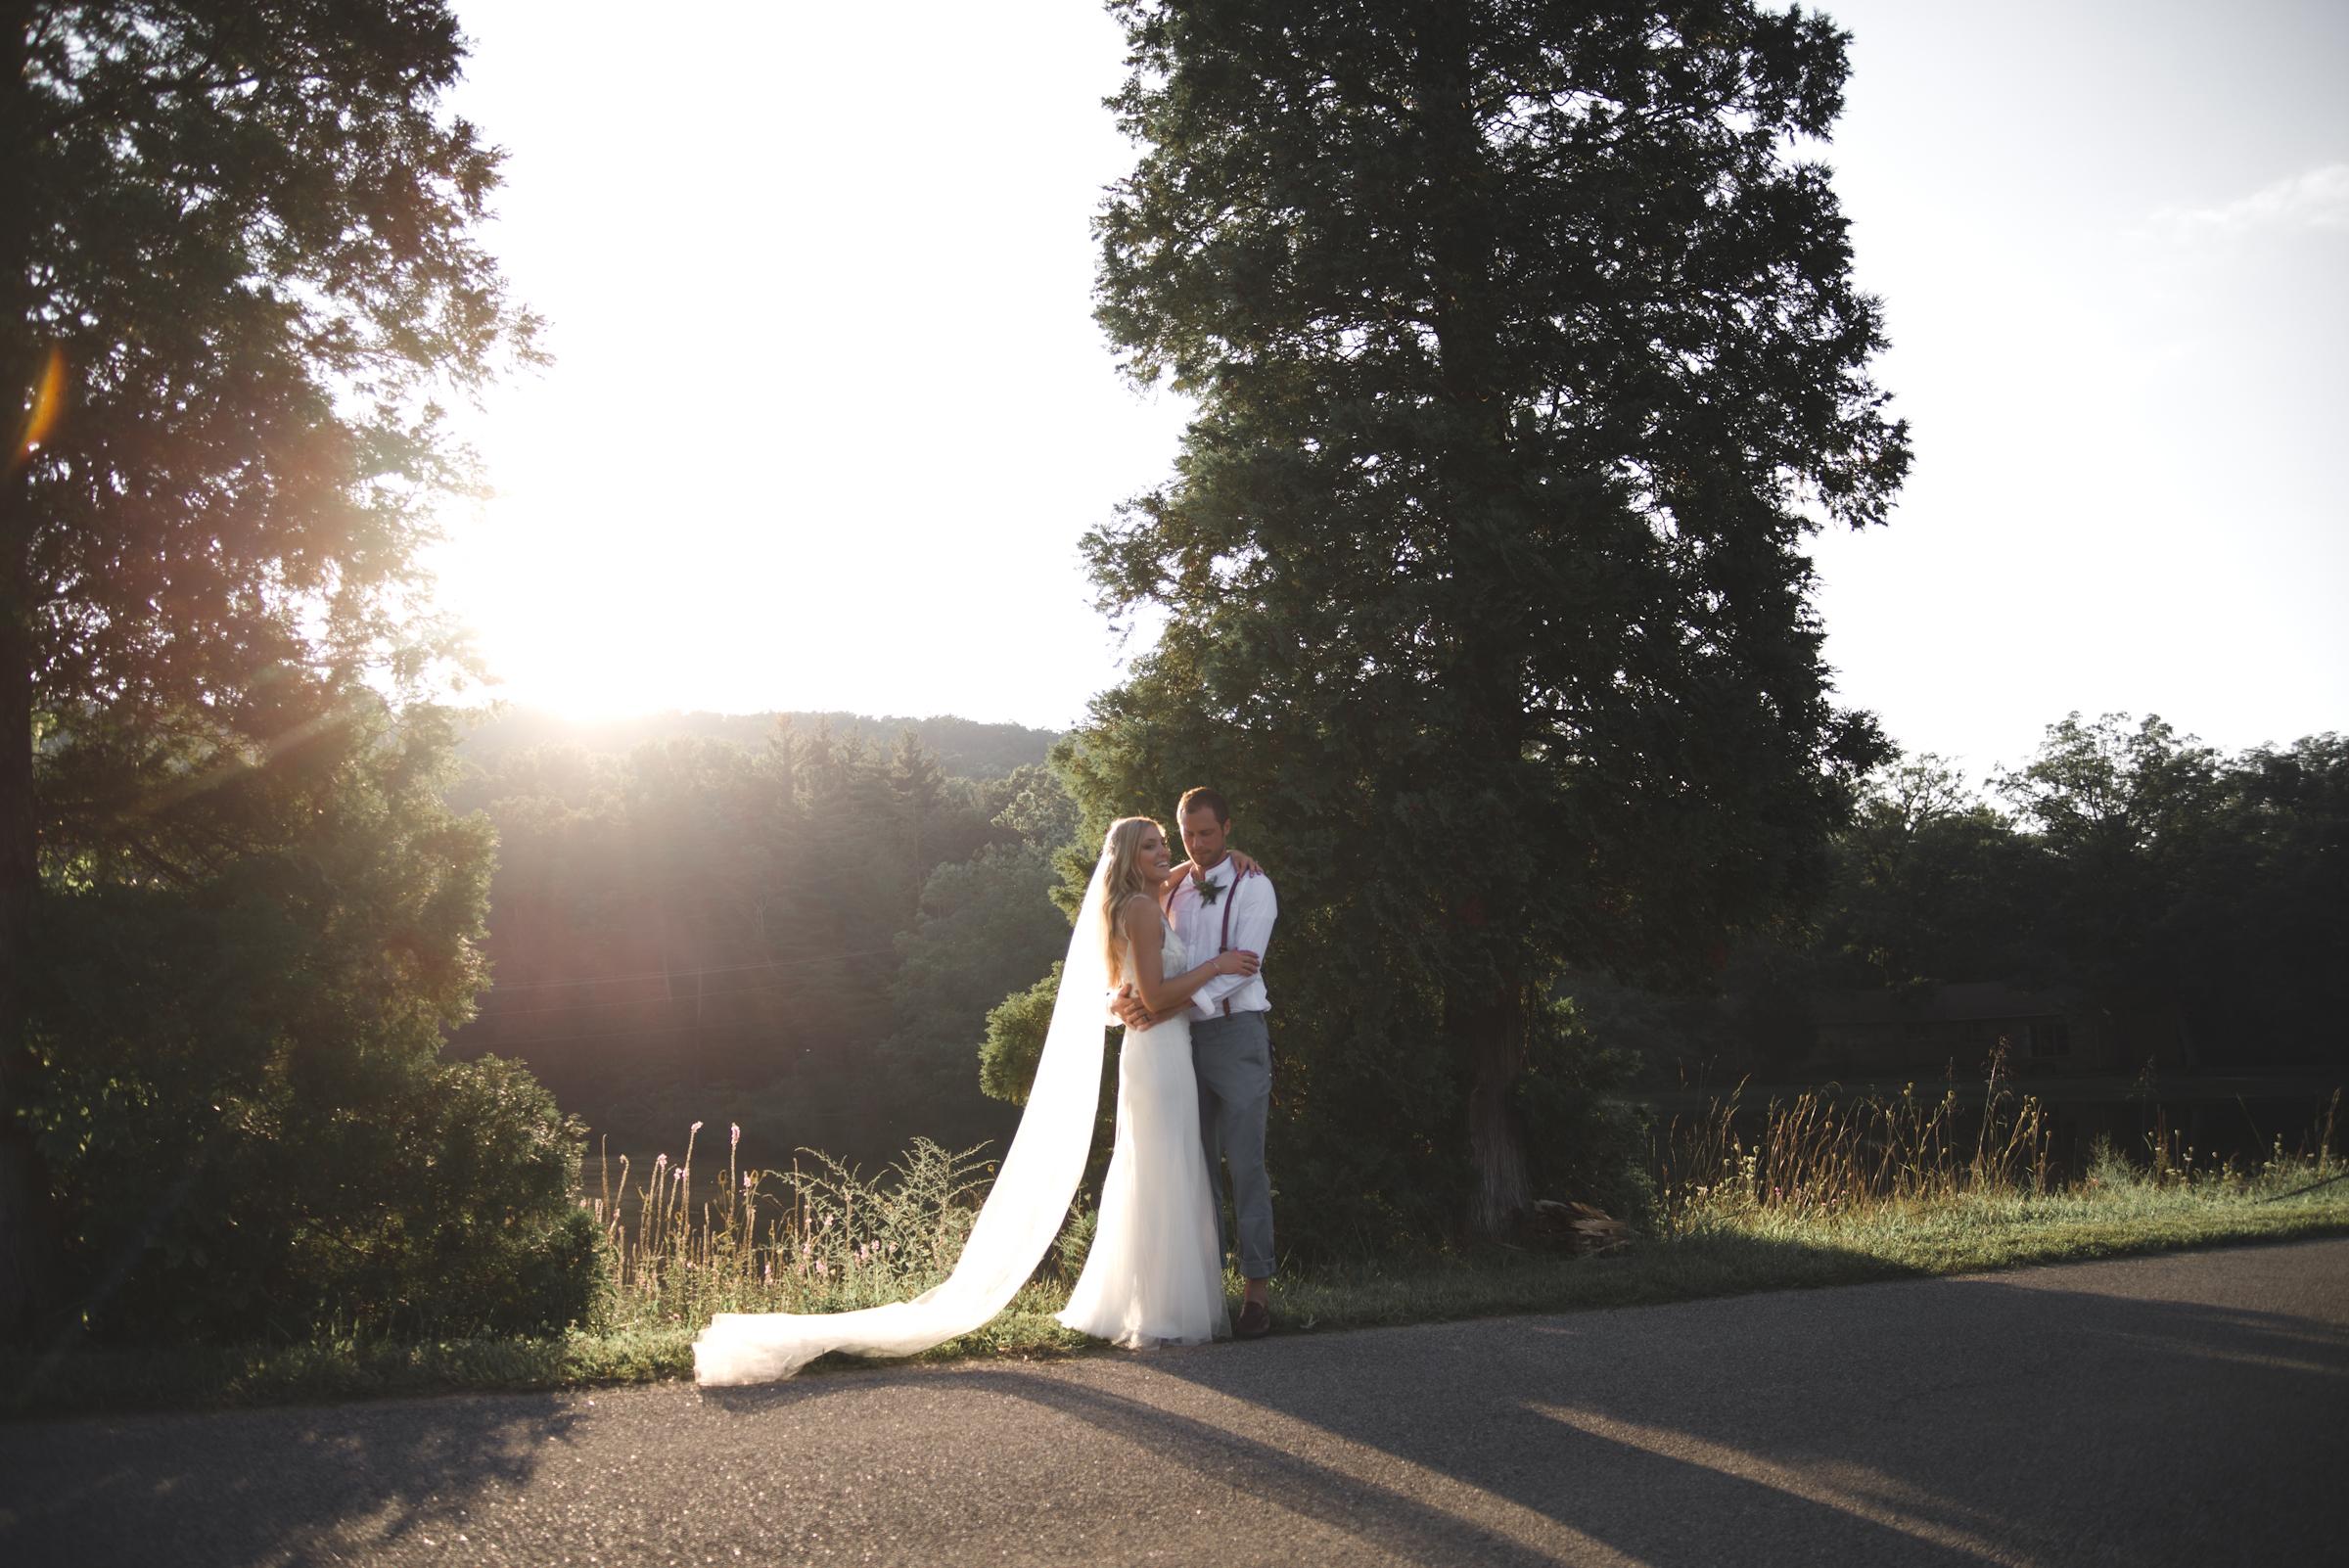 JESSY + RENO | WEDDING